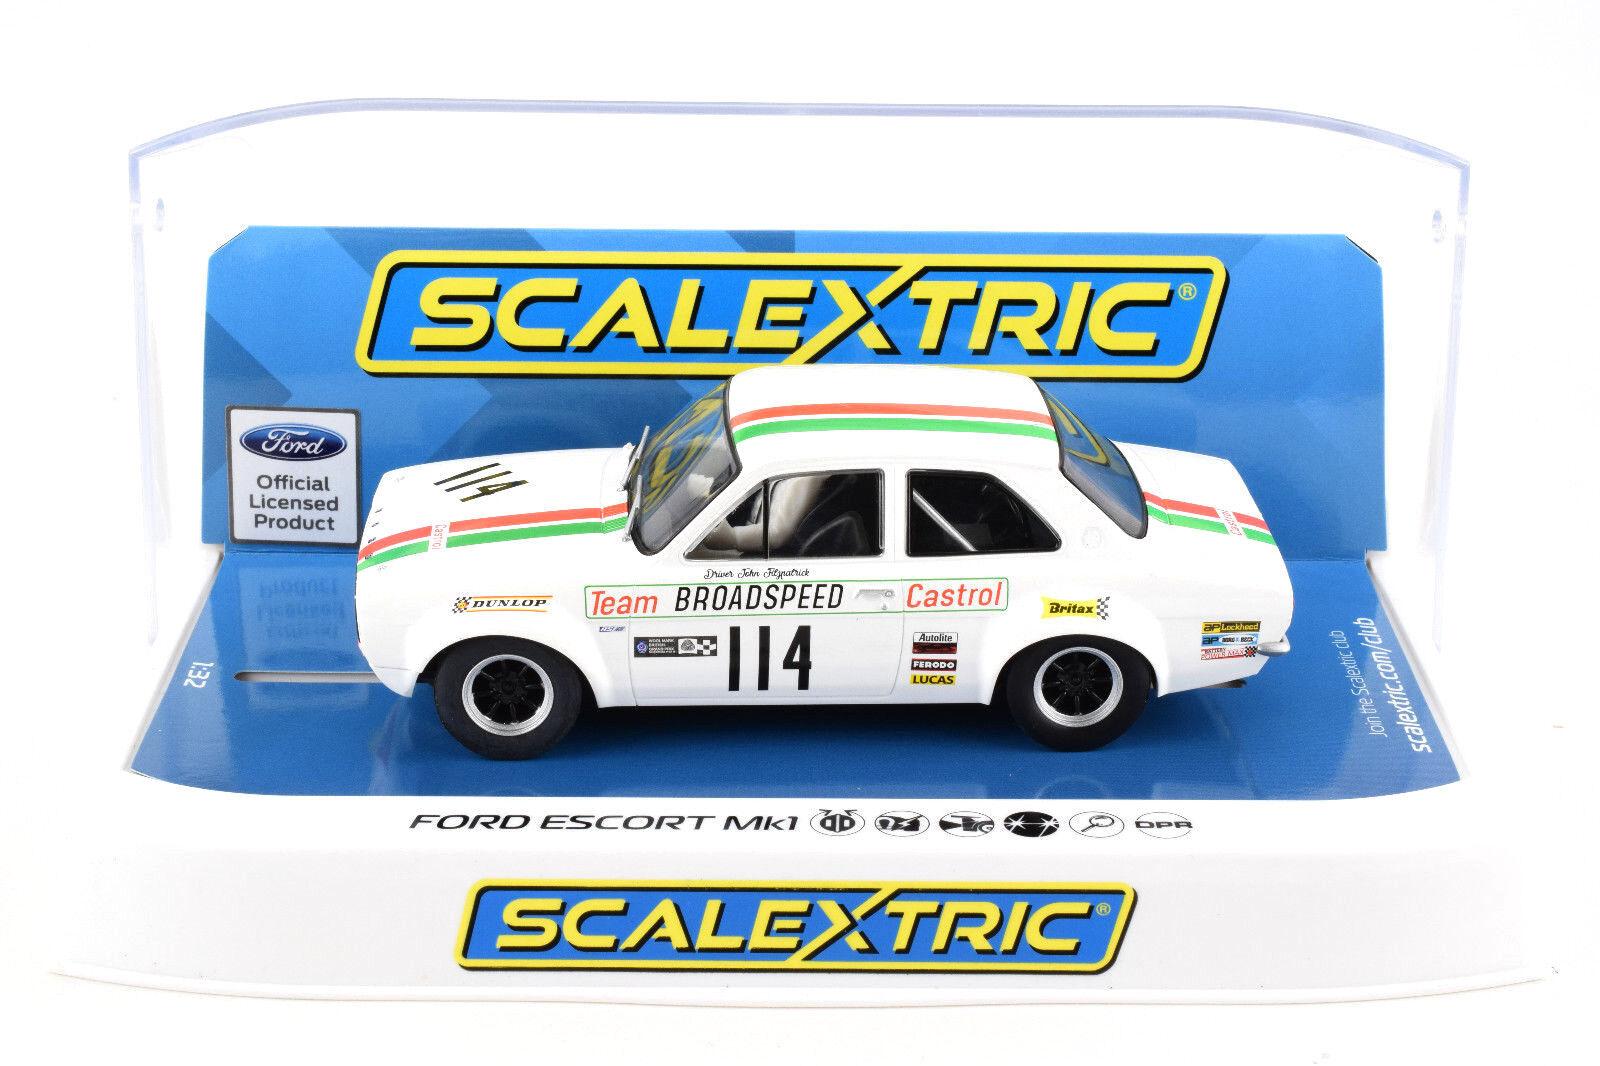 Scalextric  Castrol  Ford Escort Mk1 DPR W  Lights 1 32 Scale Slot Car C3924